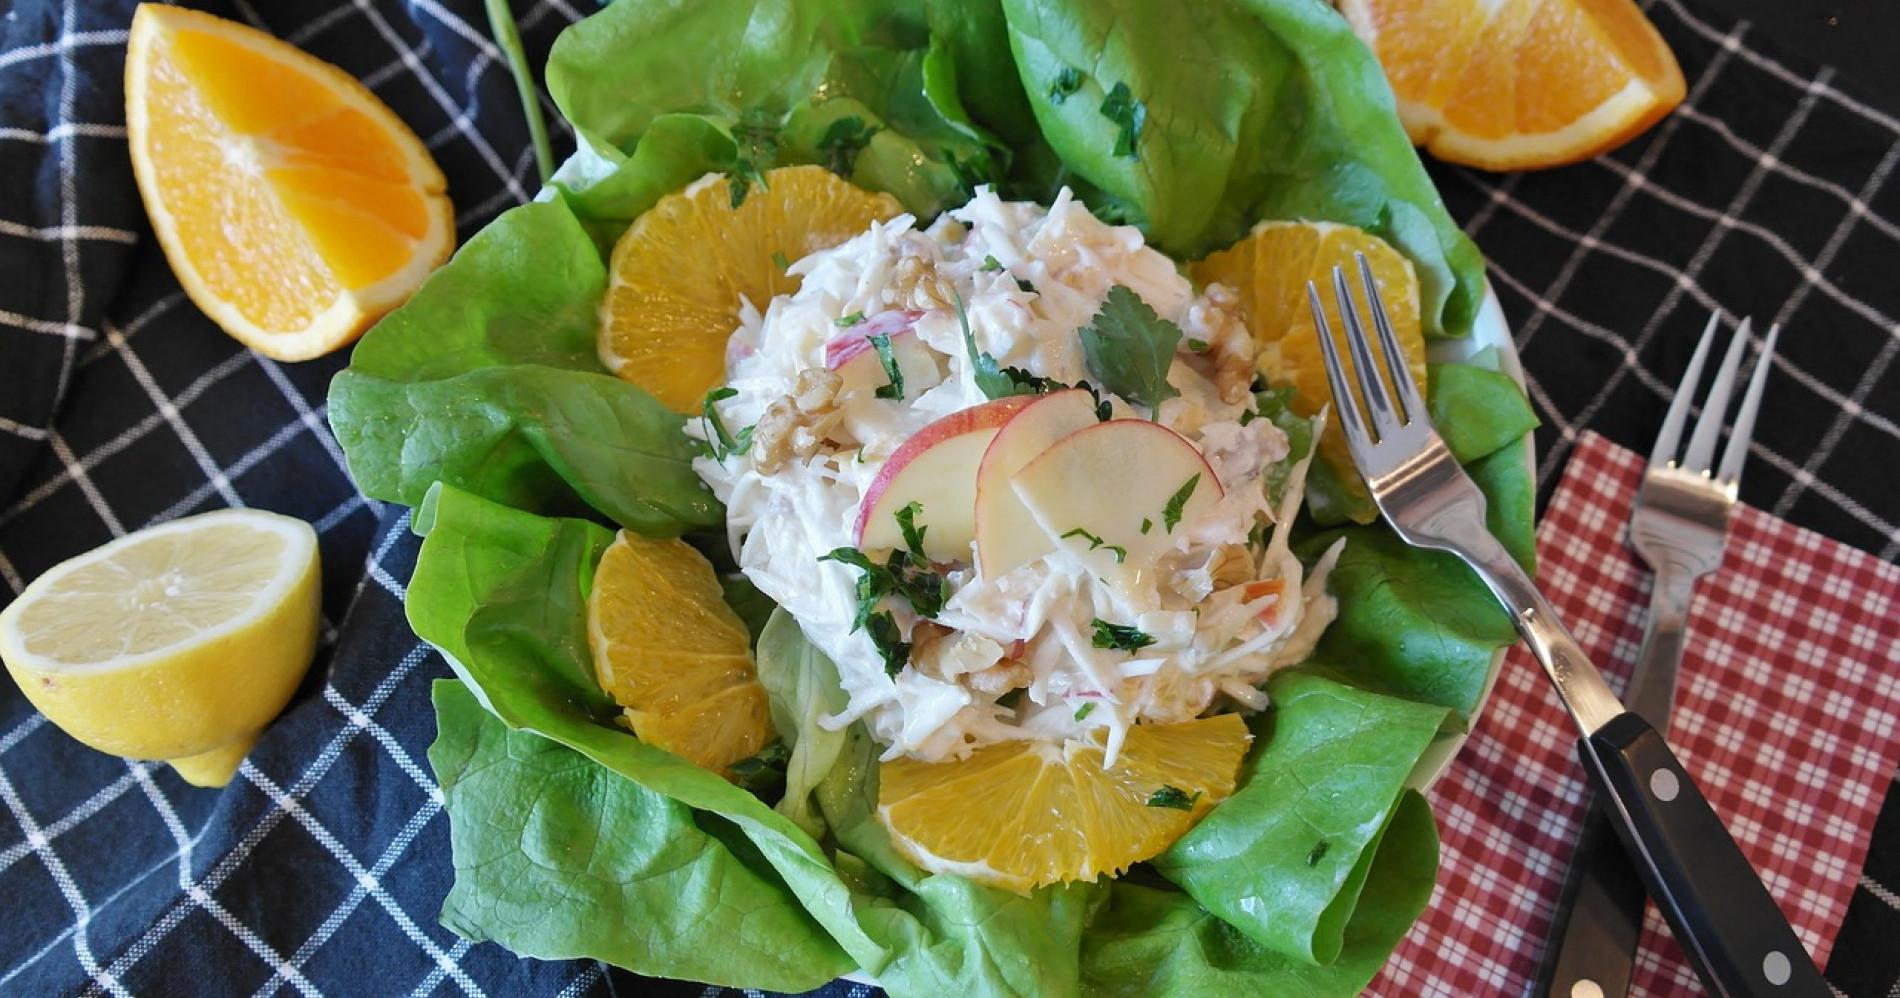 Mayones untuk salad buah (Sumber: Pixabay.com)